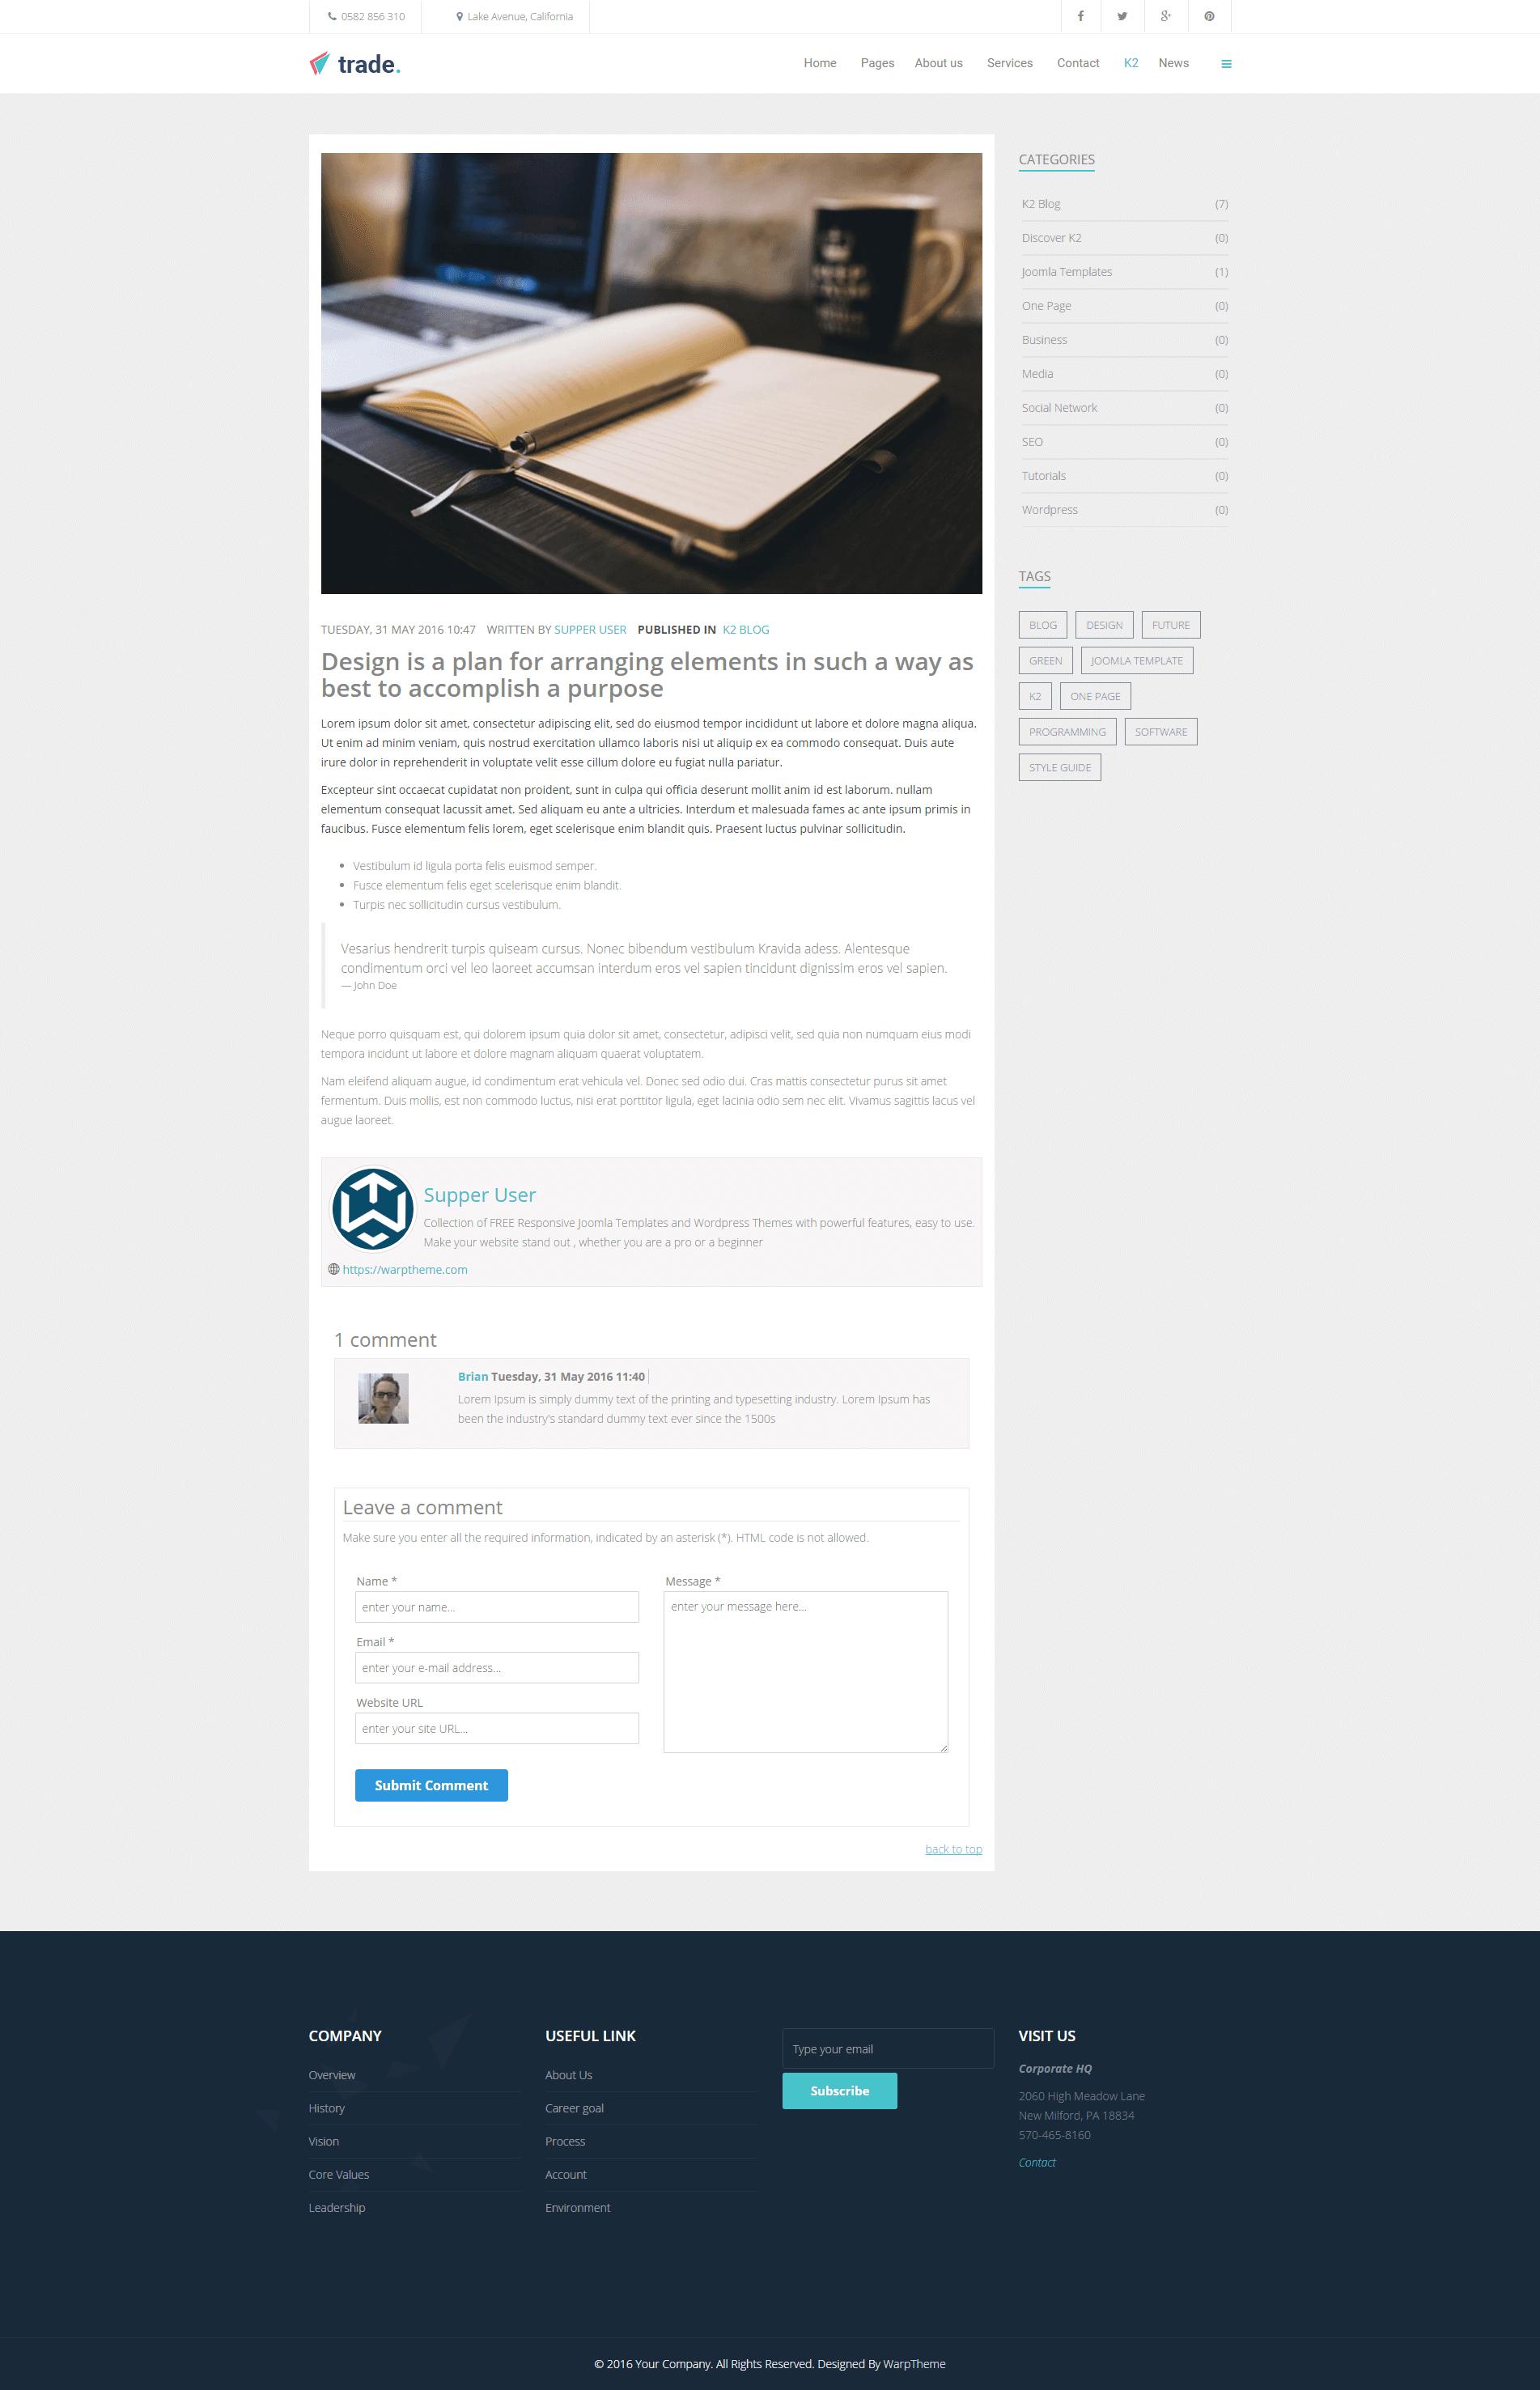 K2 page detail